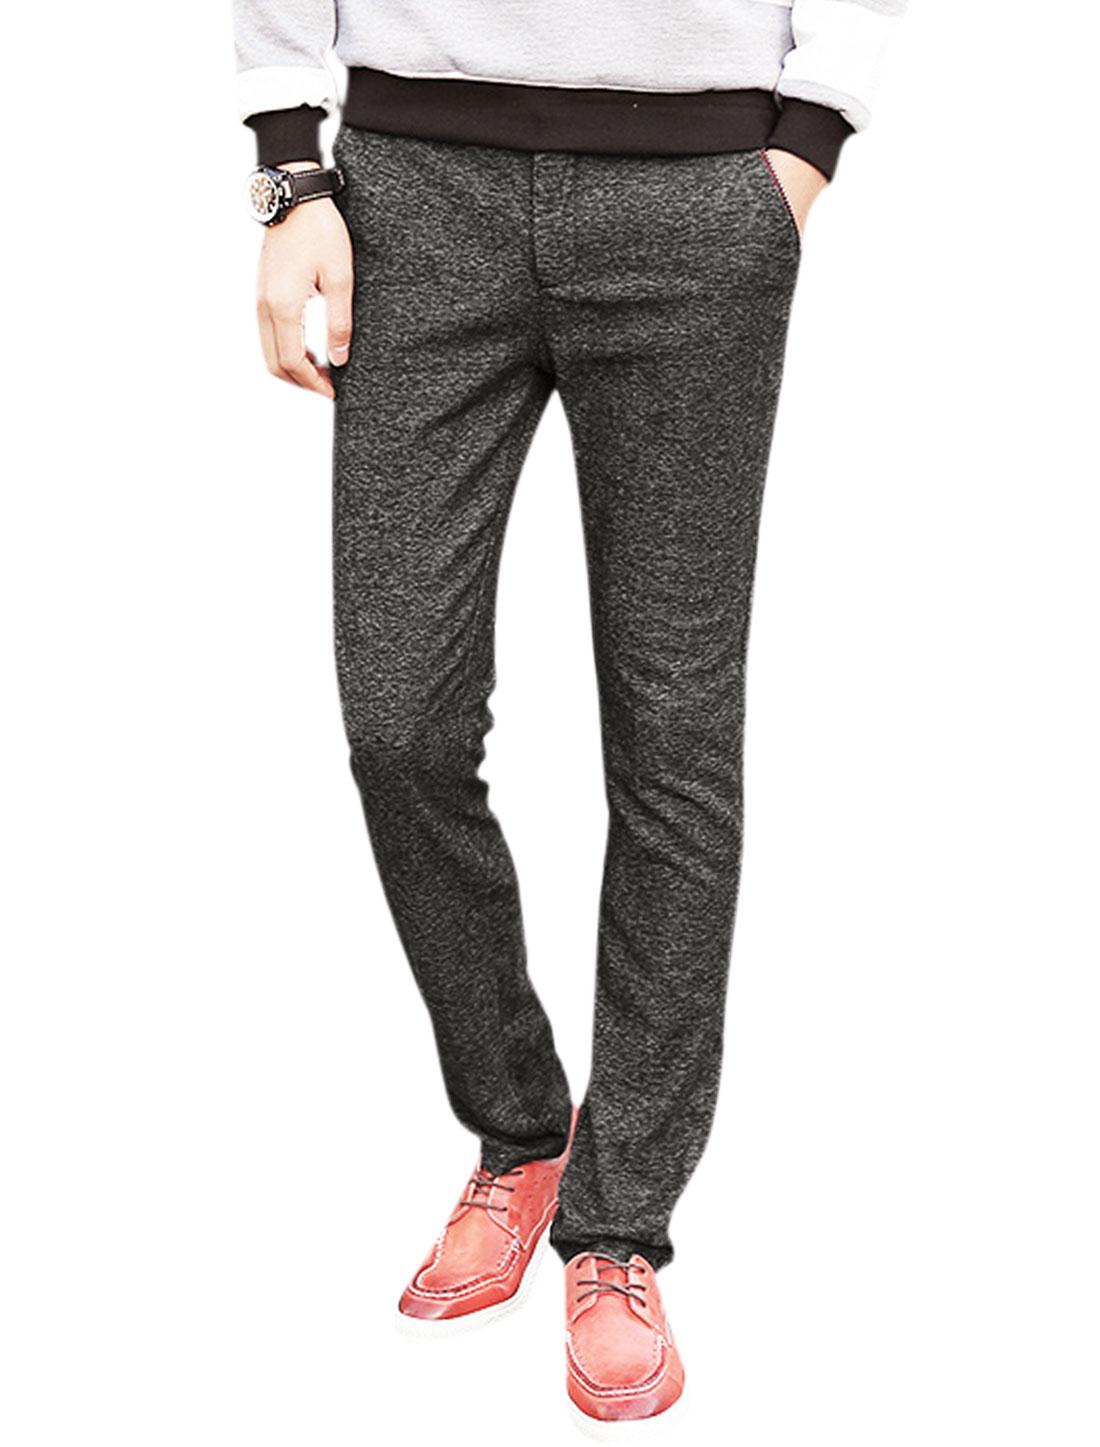 Men Zip Fly Striped Waist Straight Leg Slim Fit Trousers Black W32